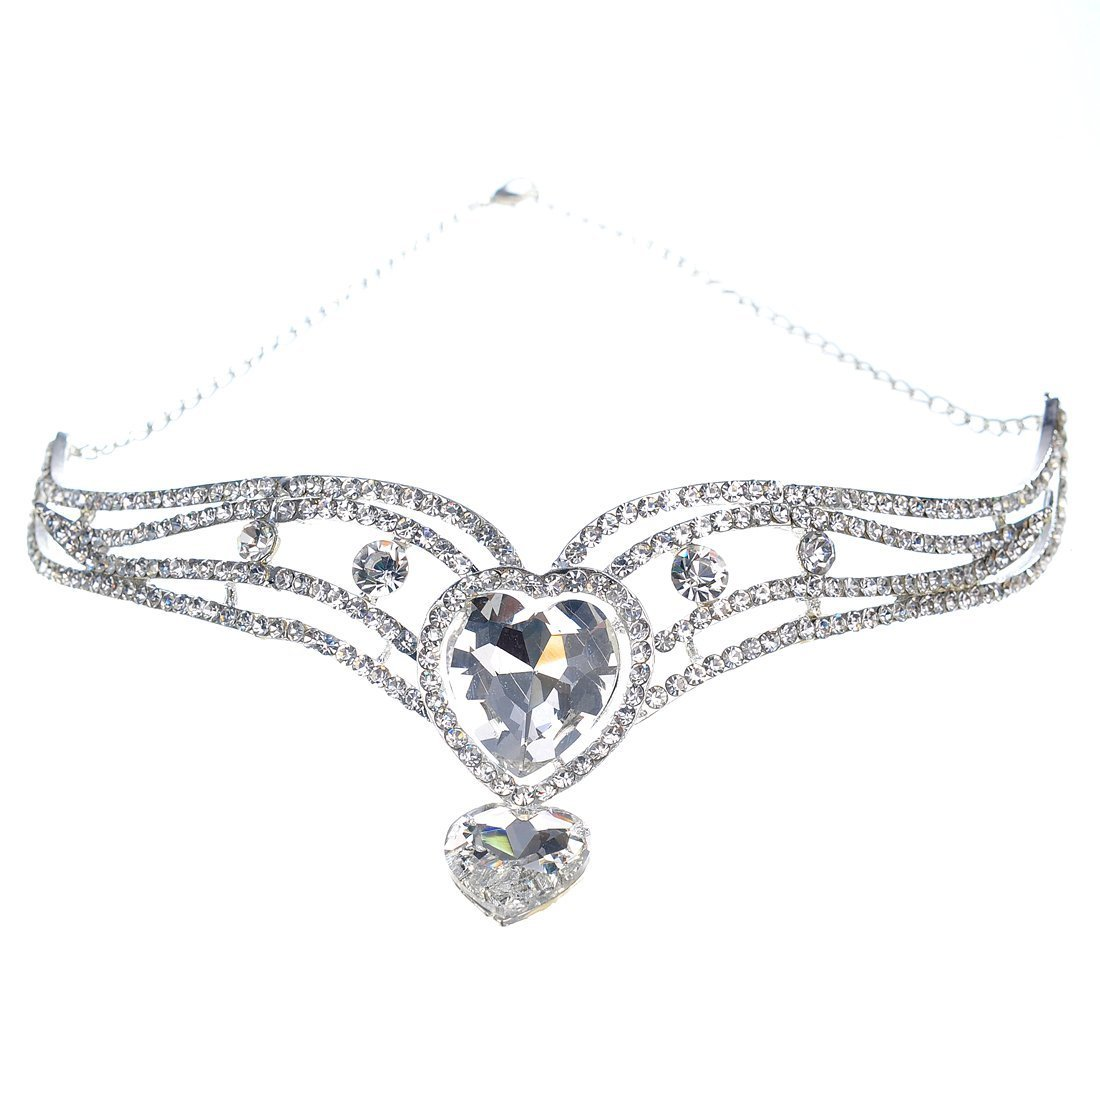 Remedios Luxury Crystal Rhinestone Wedding Headpiece Headband Princess Forehead Chain Tiara